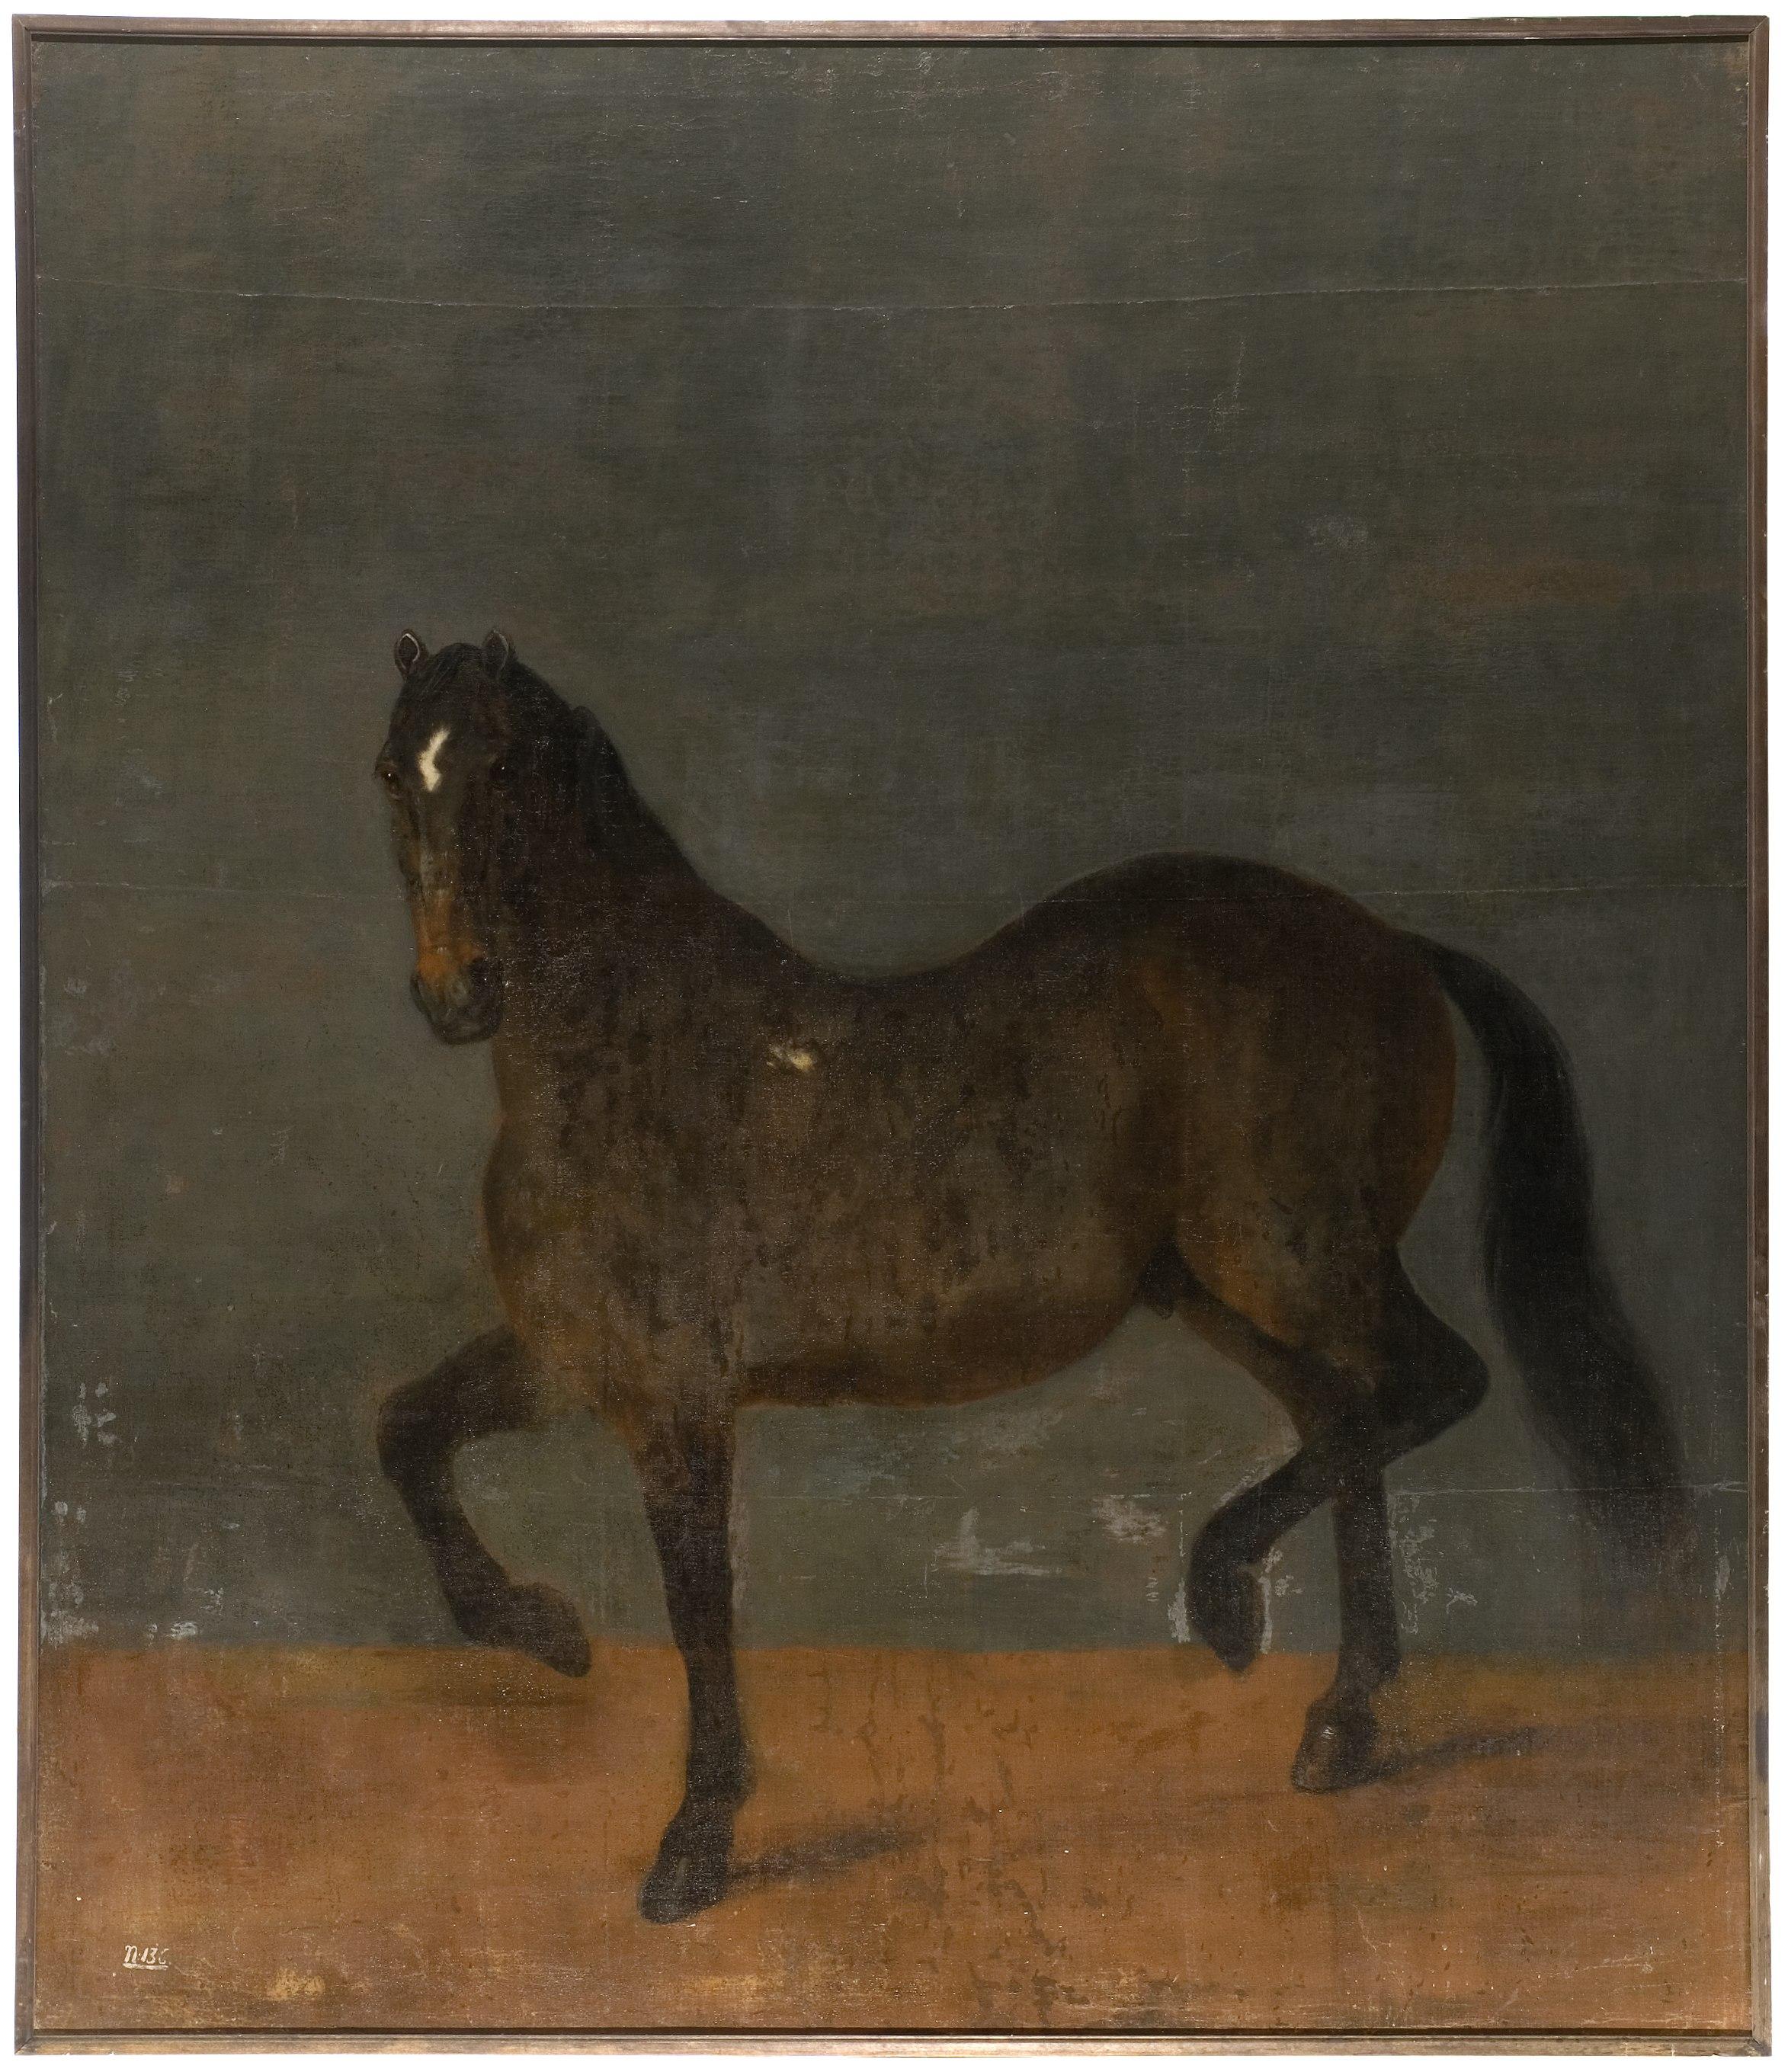 David Klöcker Ehrenstrahl, Häst kallad Brandklipparen, Nationalmuseum